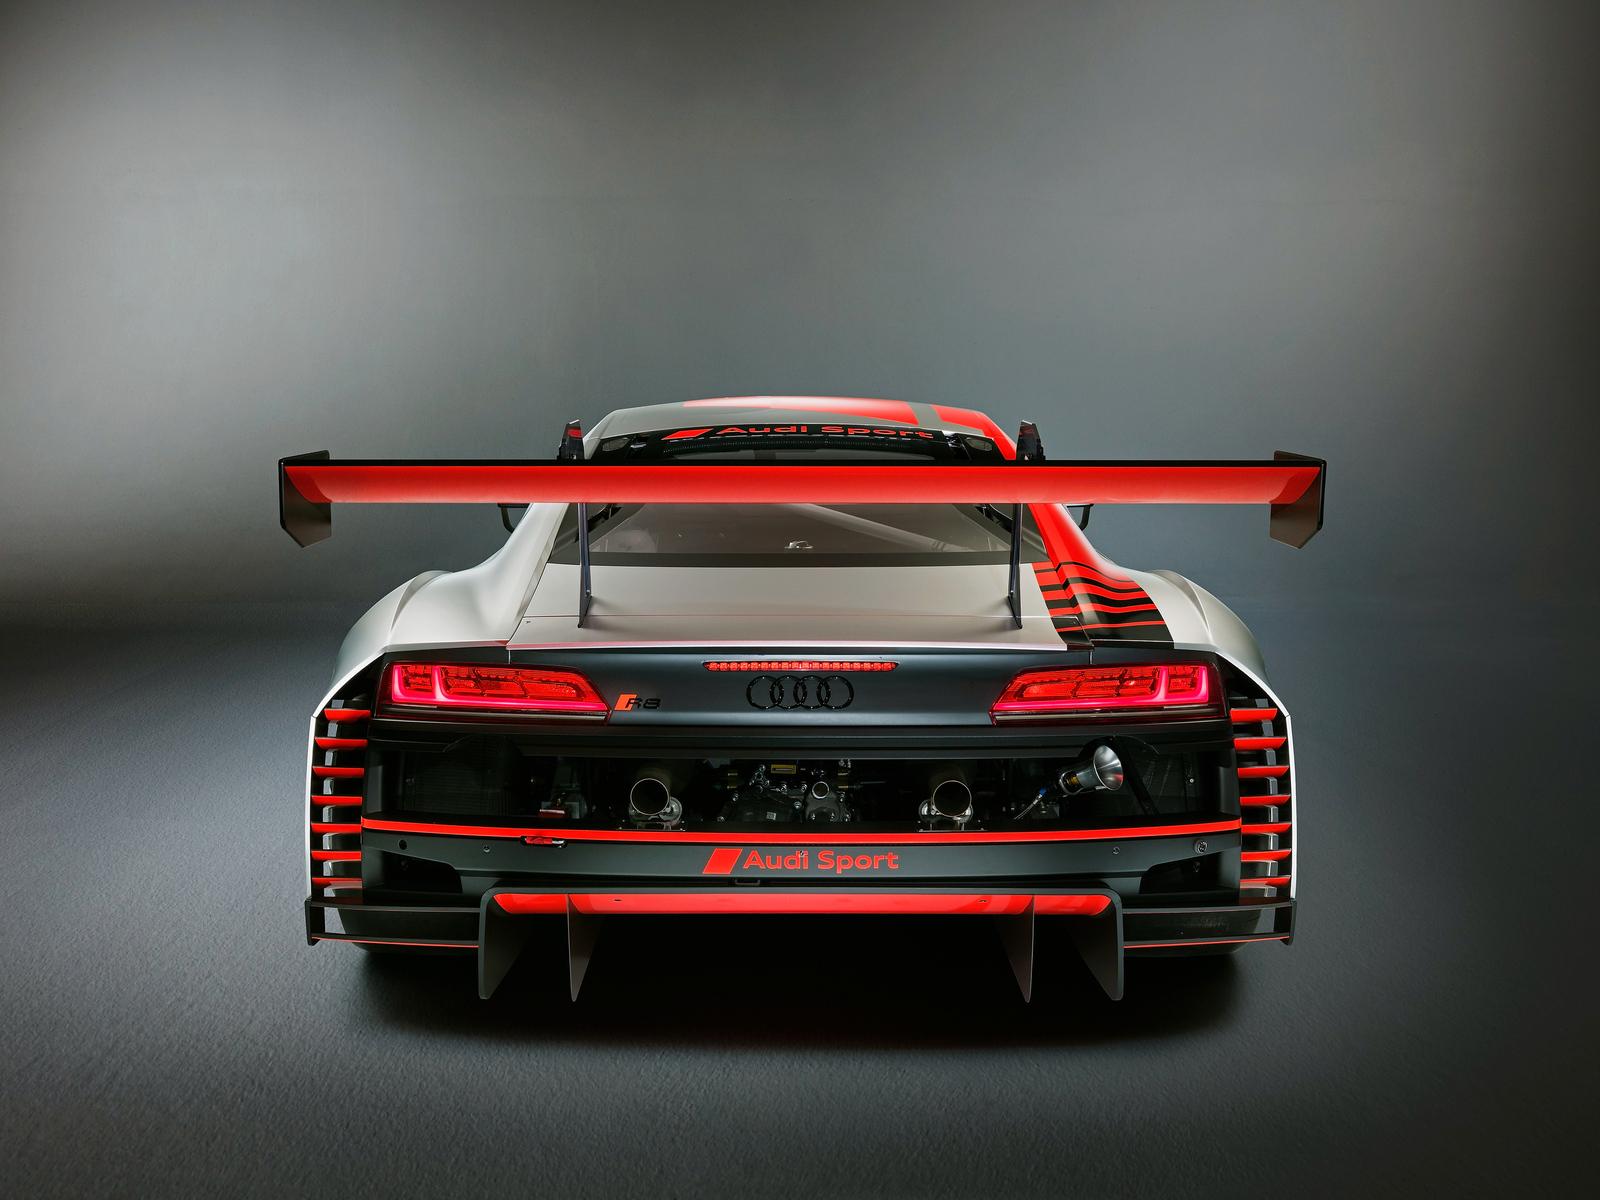 audi-r8-lms-2019-rear-li.jpg